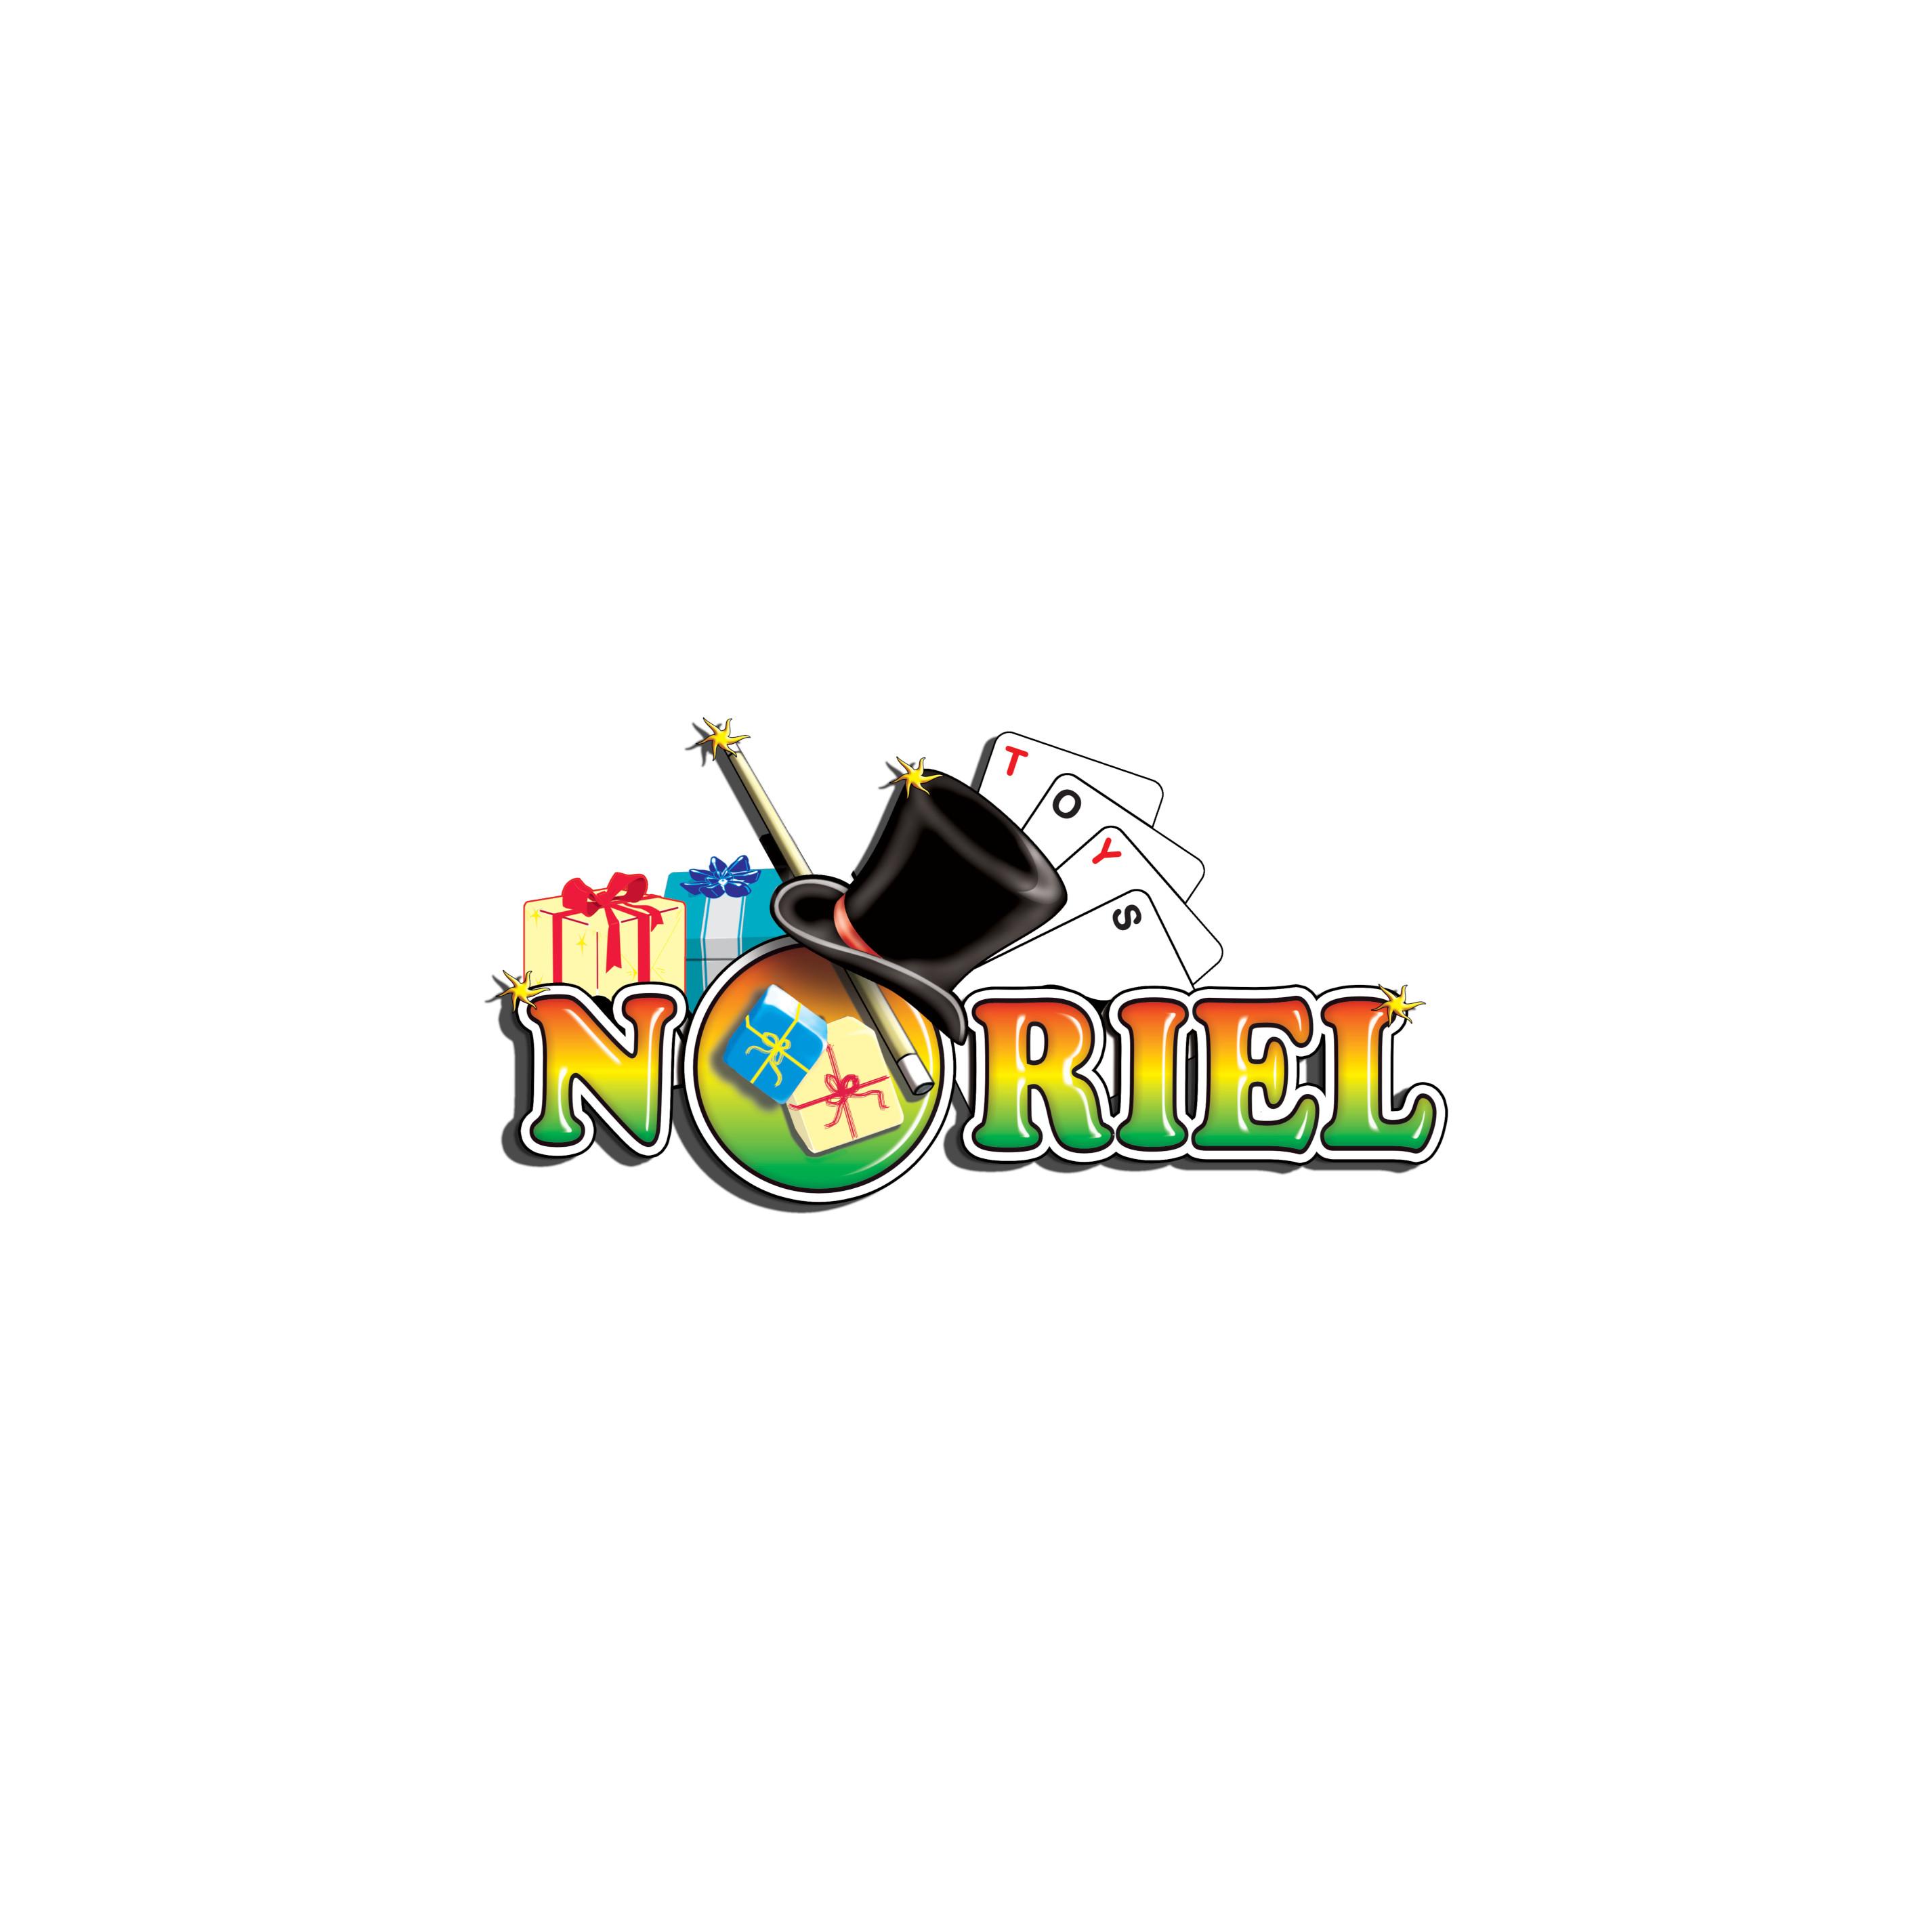 DK000646035_001w Set de 12 creioane cerate, The Littlies